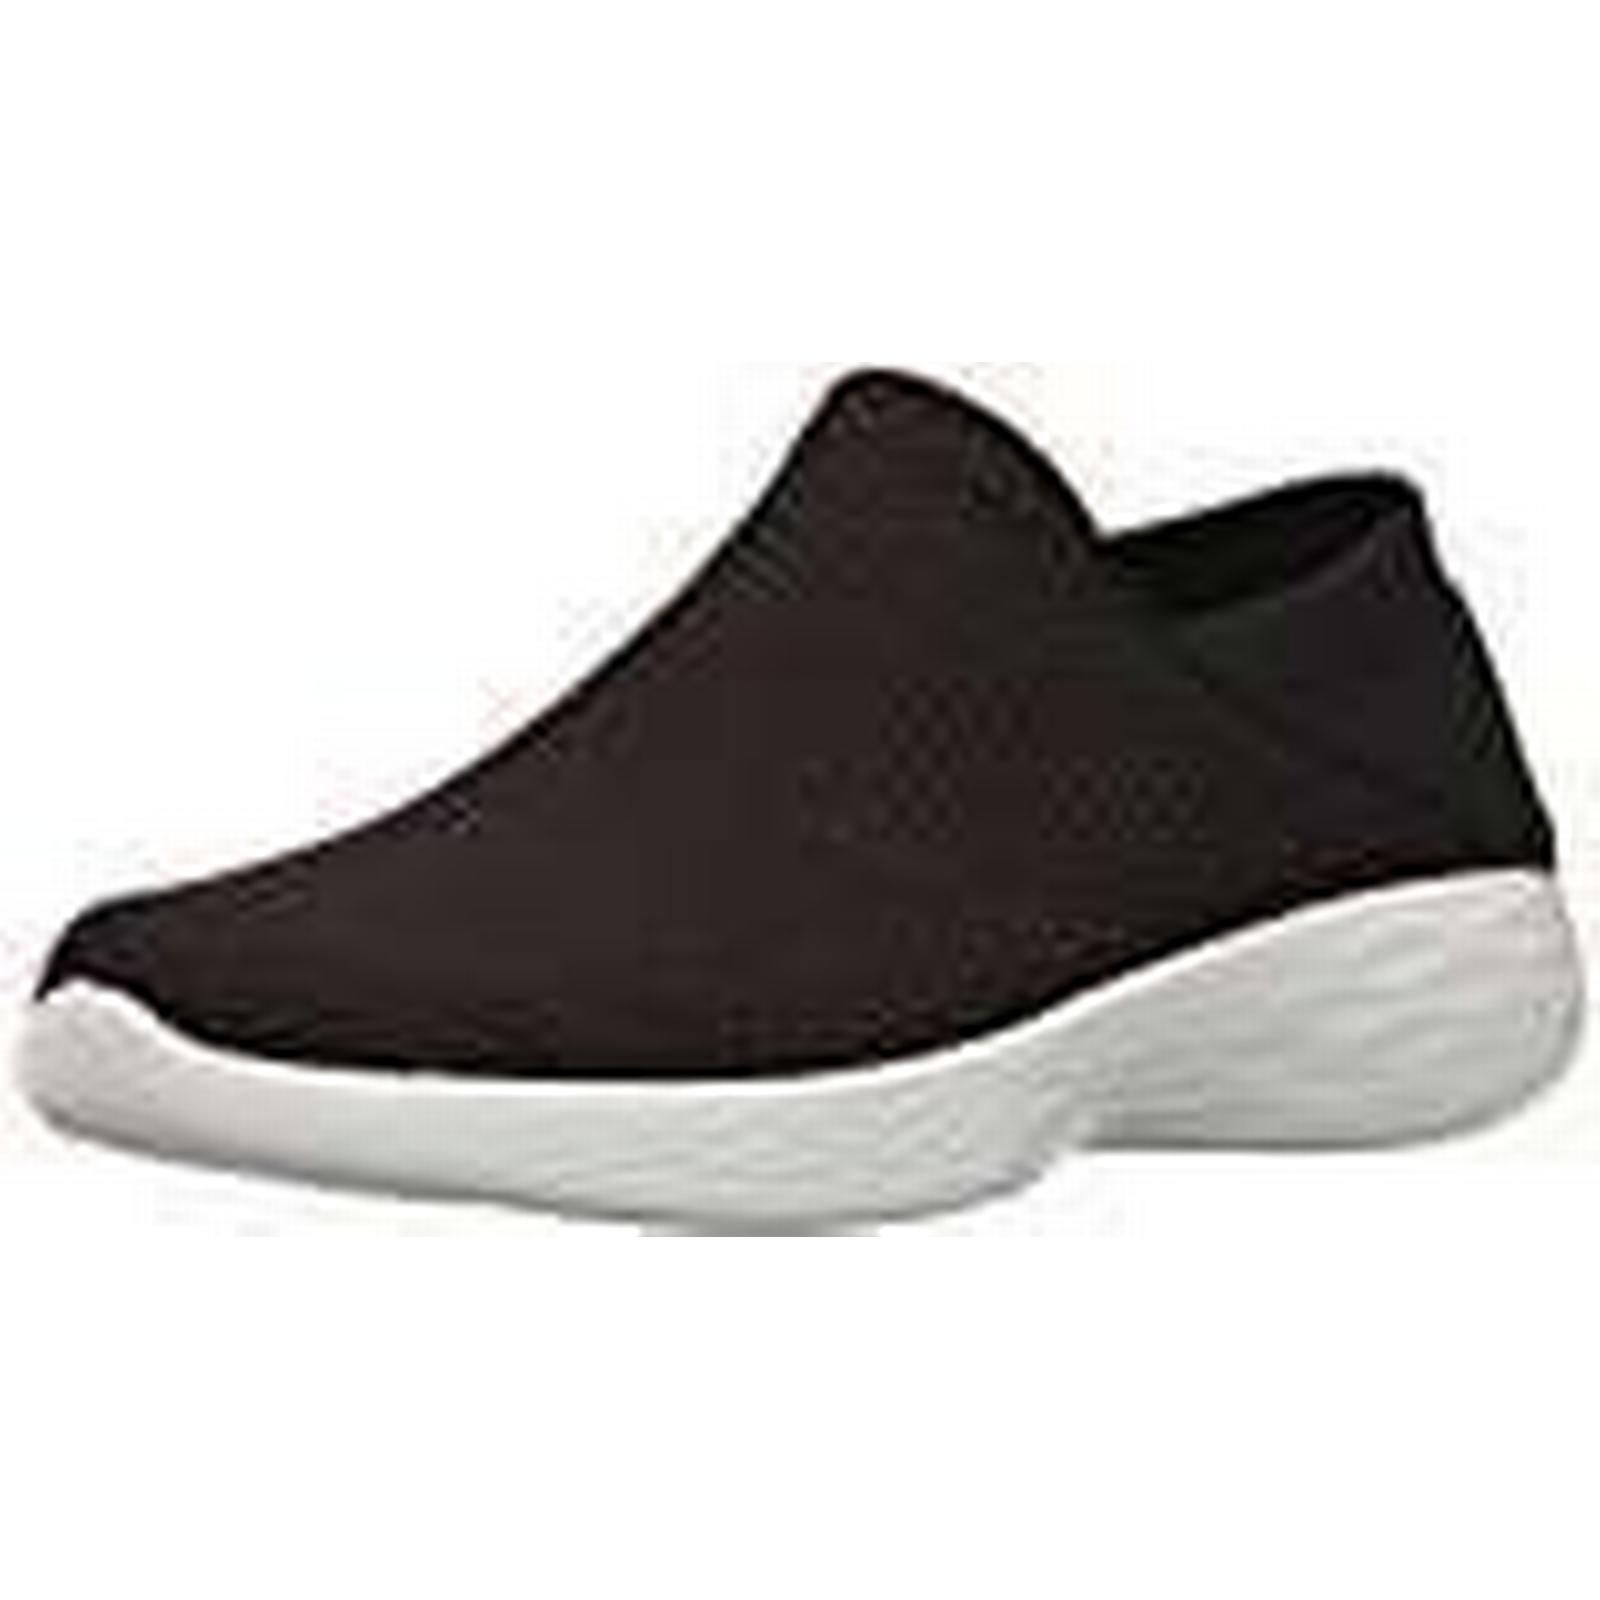 Skechers Women's You Low-Top 6 Sneakers, Black, Black (Bkw), 6 Low-Top UK da4bdd